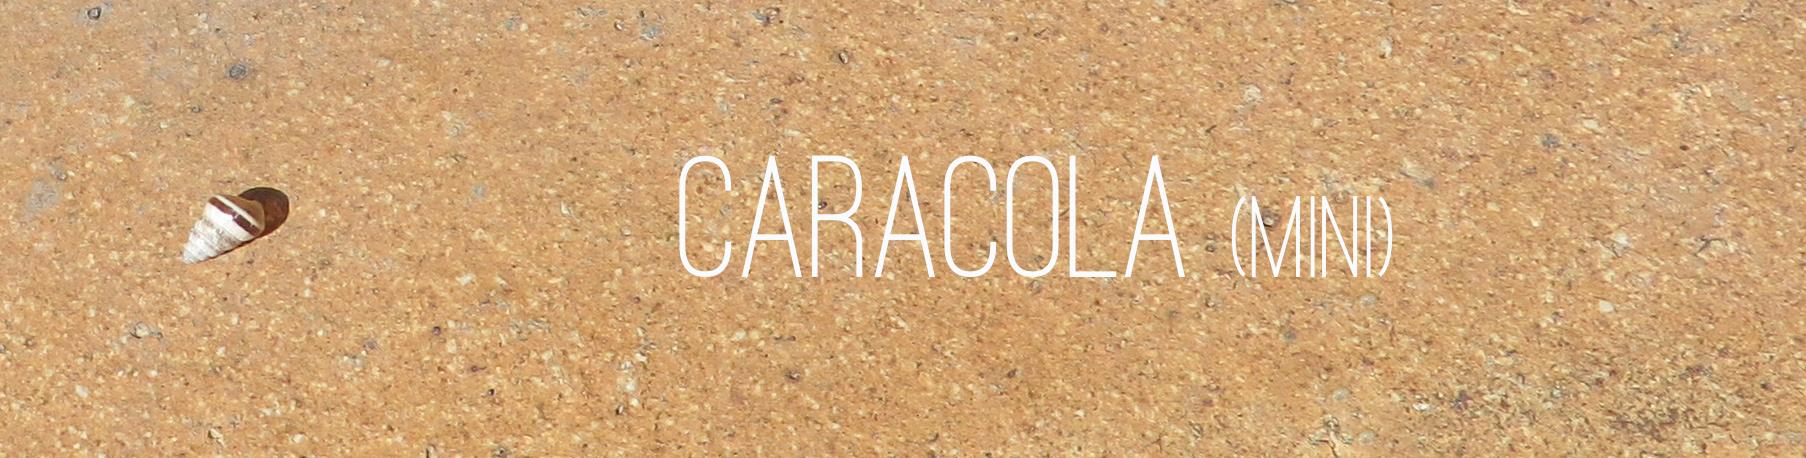 caracola2